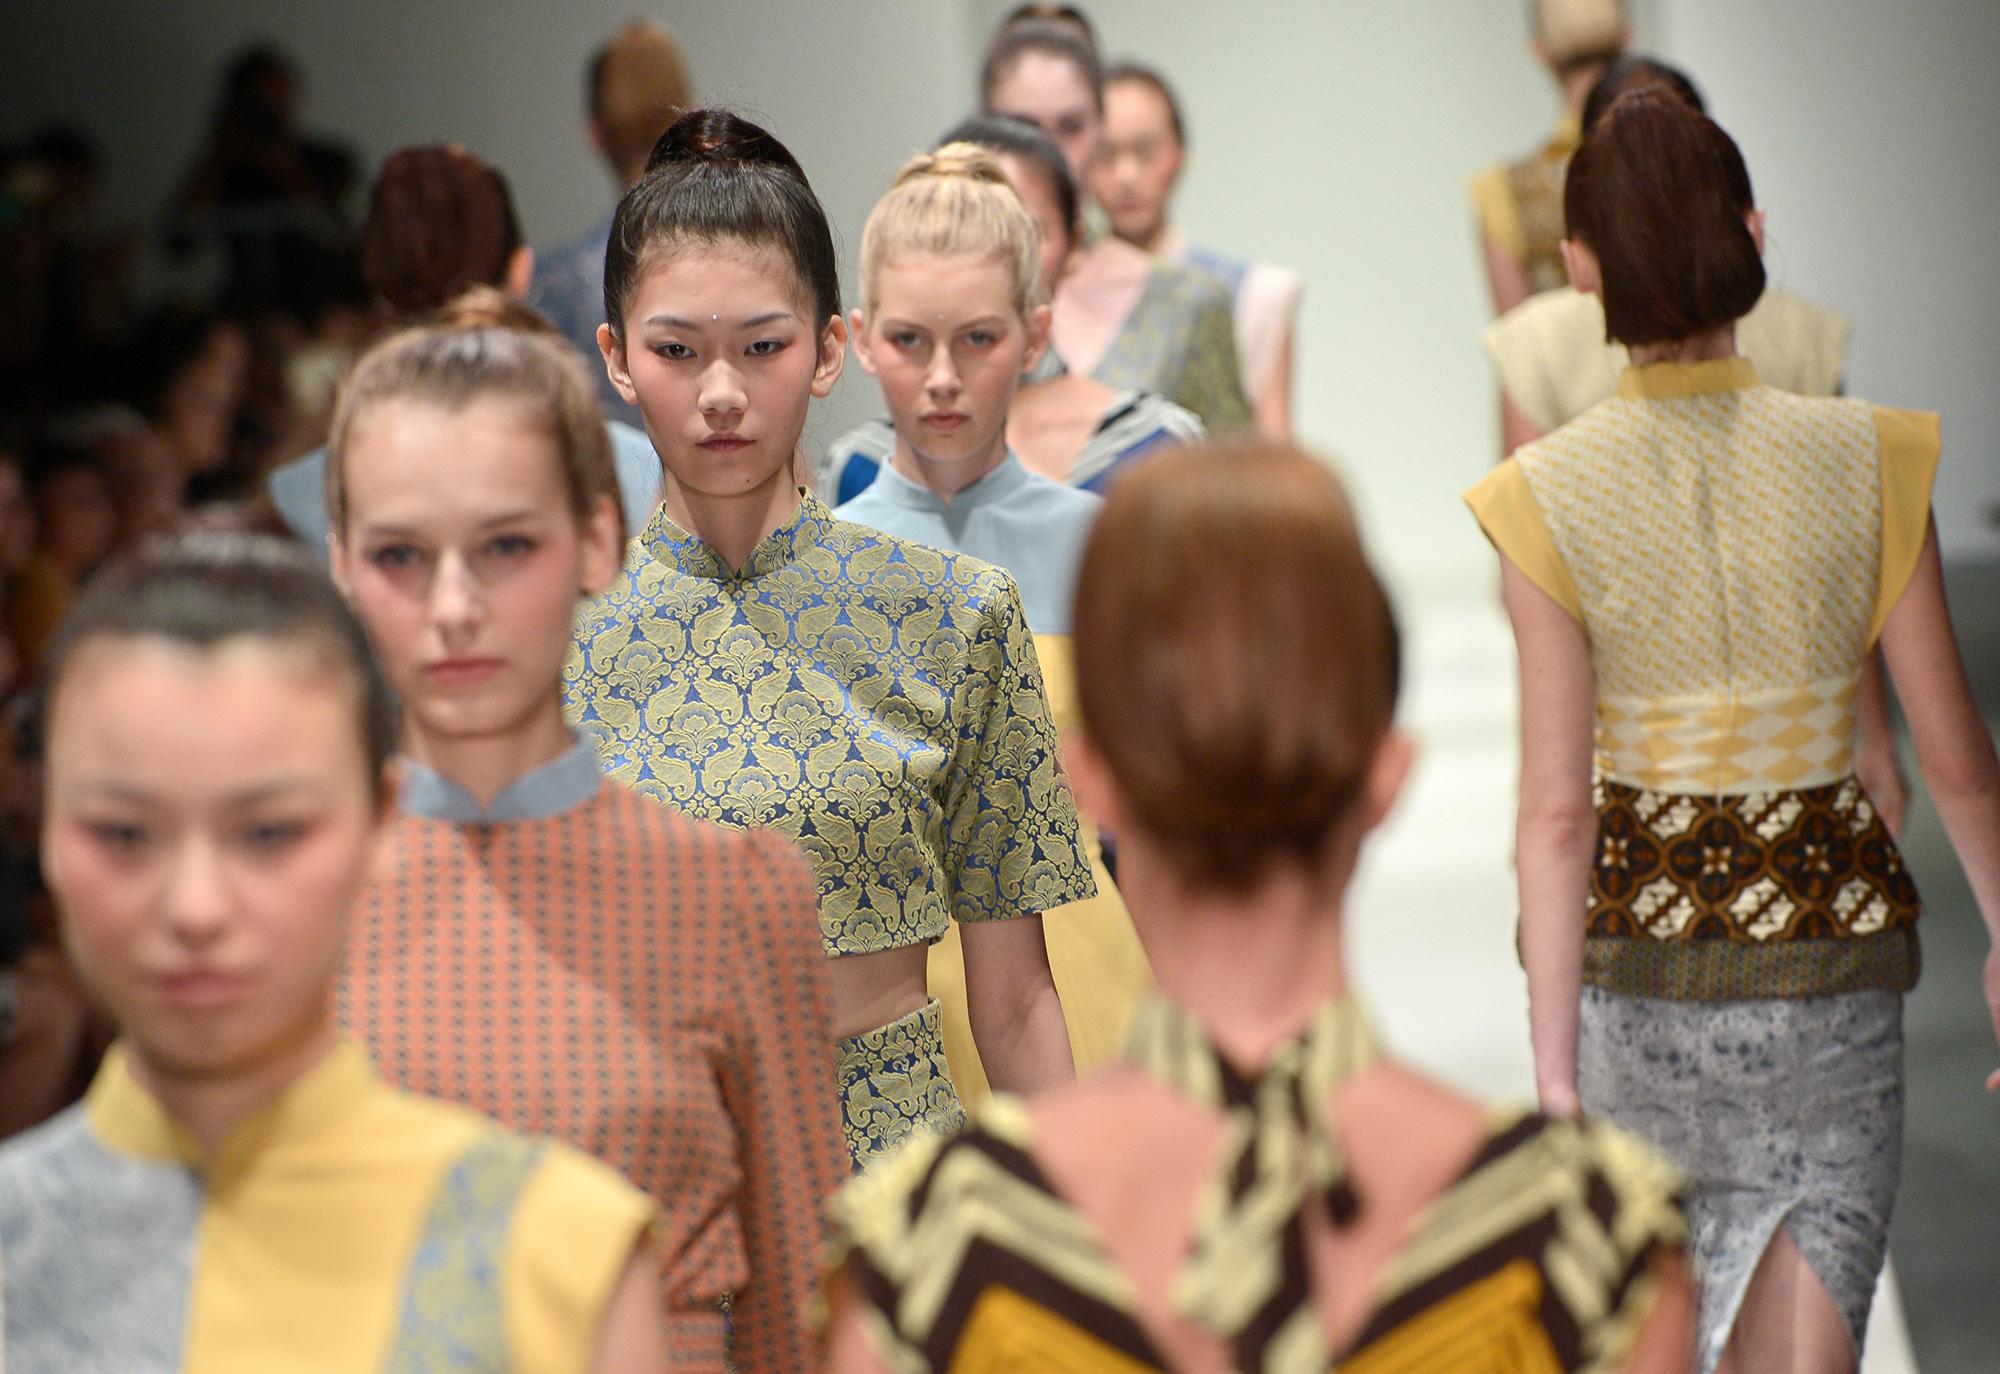 www.prestigeonline.com: Priscilla Shunmugam looks back at a decade of redefining Asian design